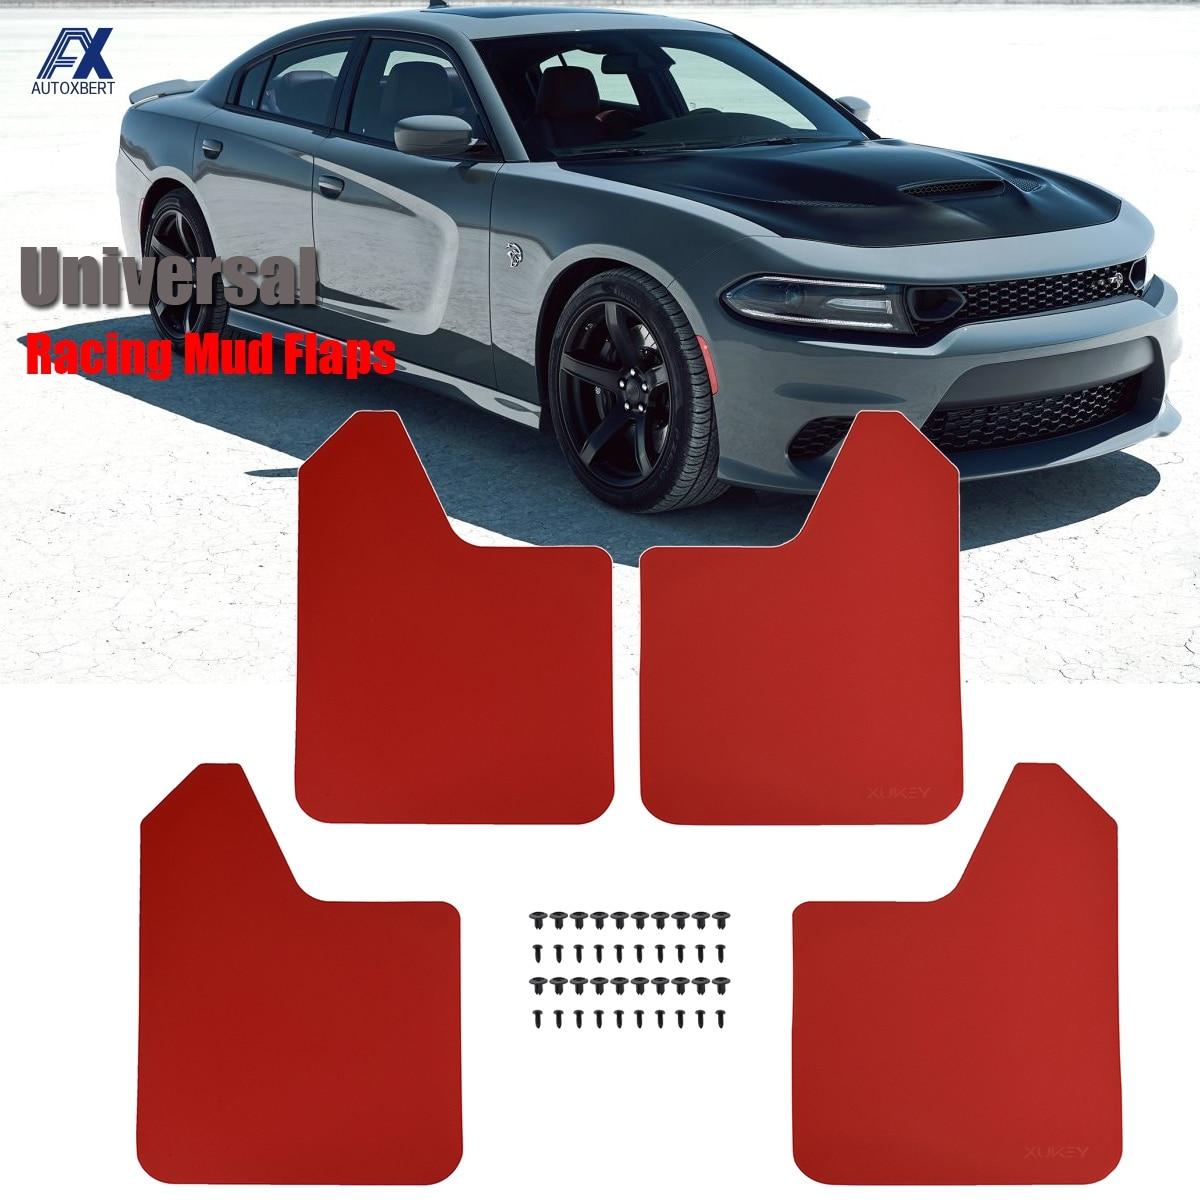 Universal Car Mud Flaps Fender Flares Splash Guards Front Rear Mudguard Splash Guards Exterior Parts for AvtoVAZ lada Niva 2020